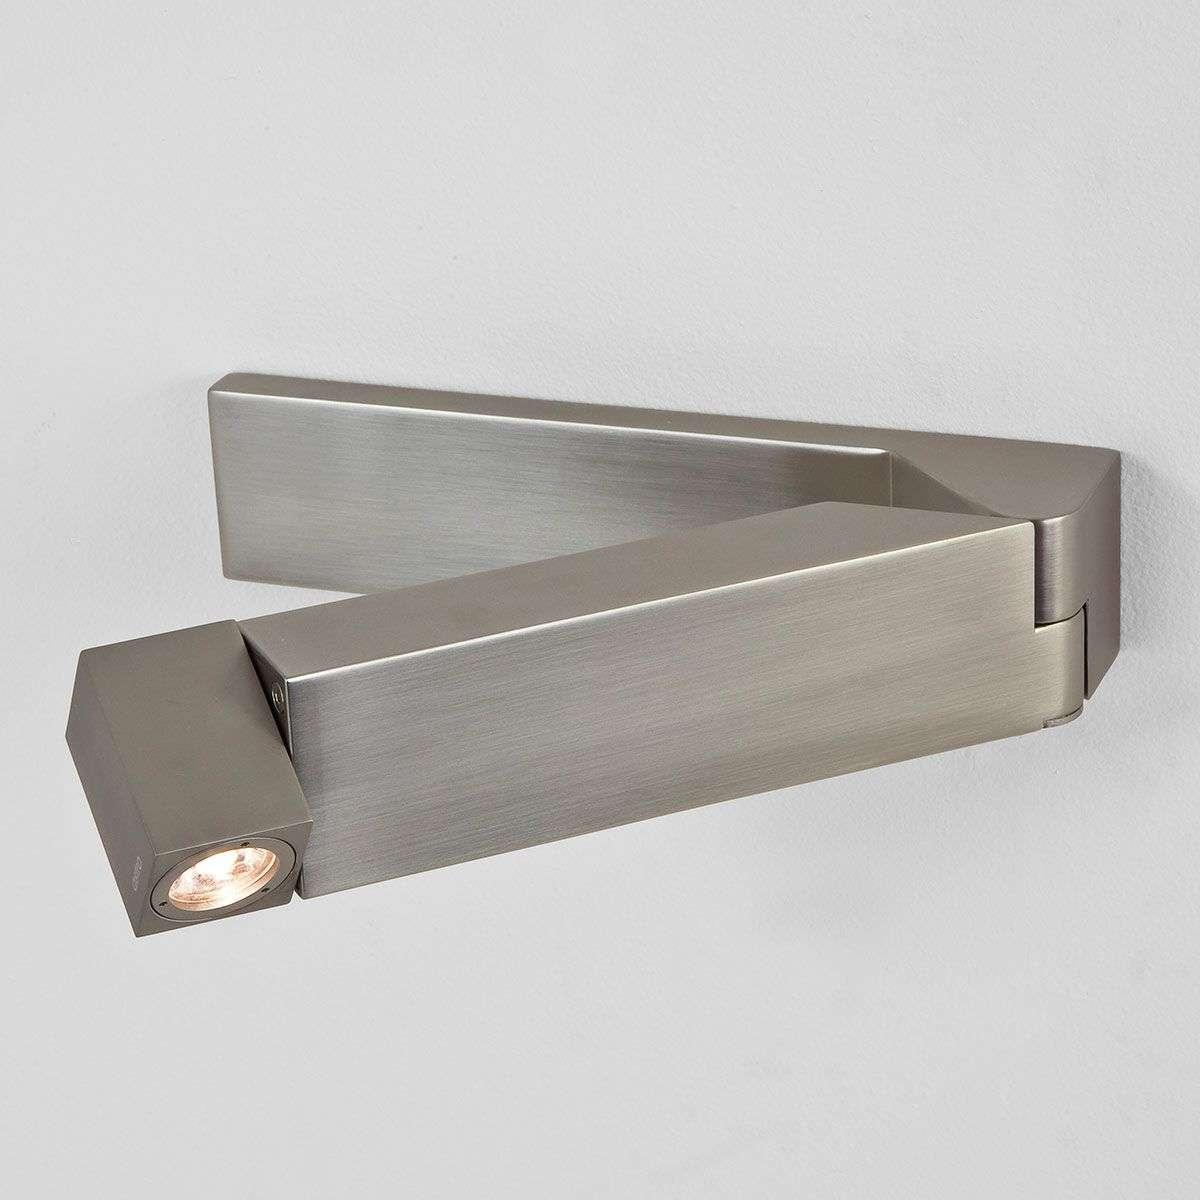 Tosca LED Wall Light Modern Nickel Matte-1020206-32